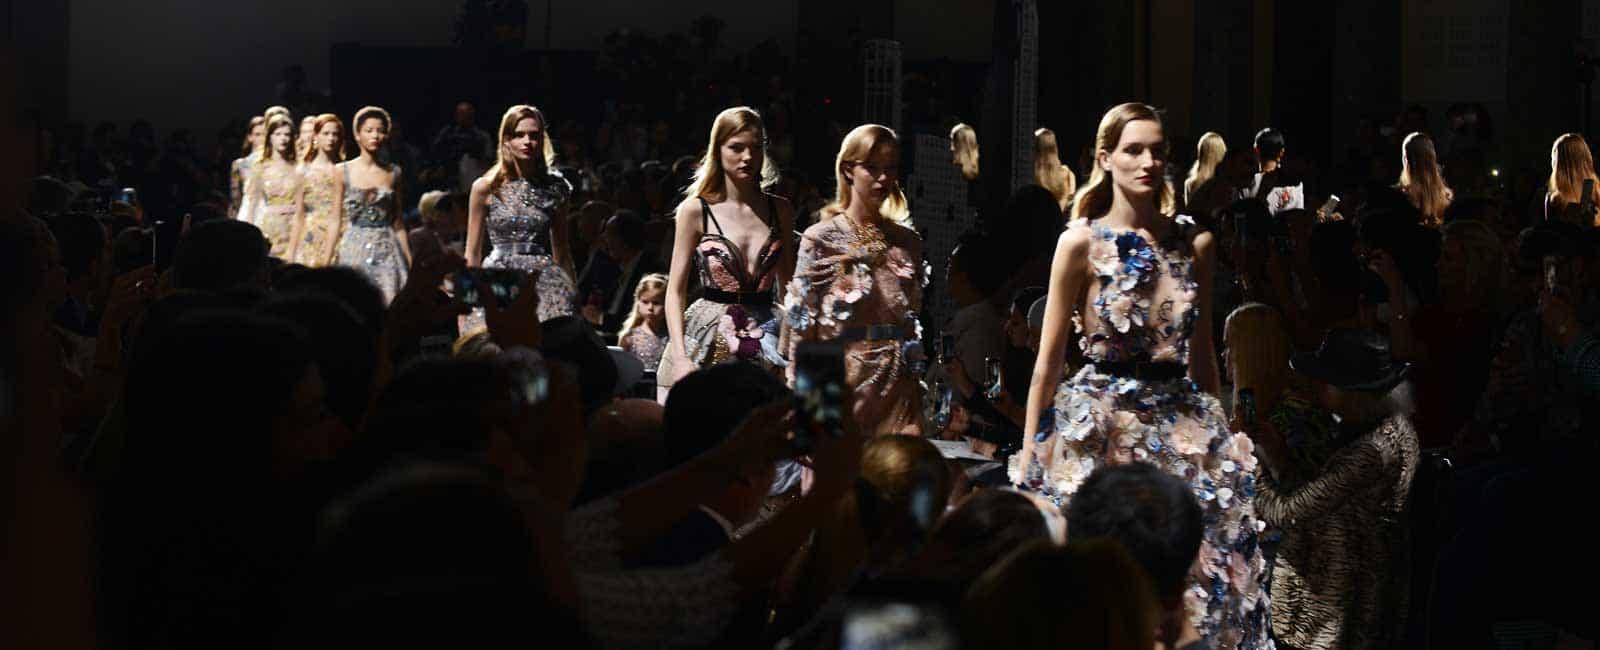 Paris Fashion Week 2016: Elie Saab